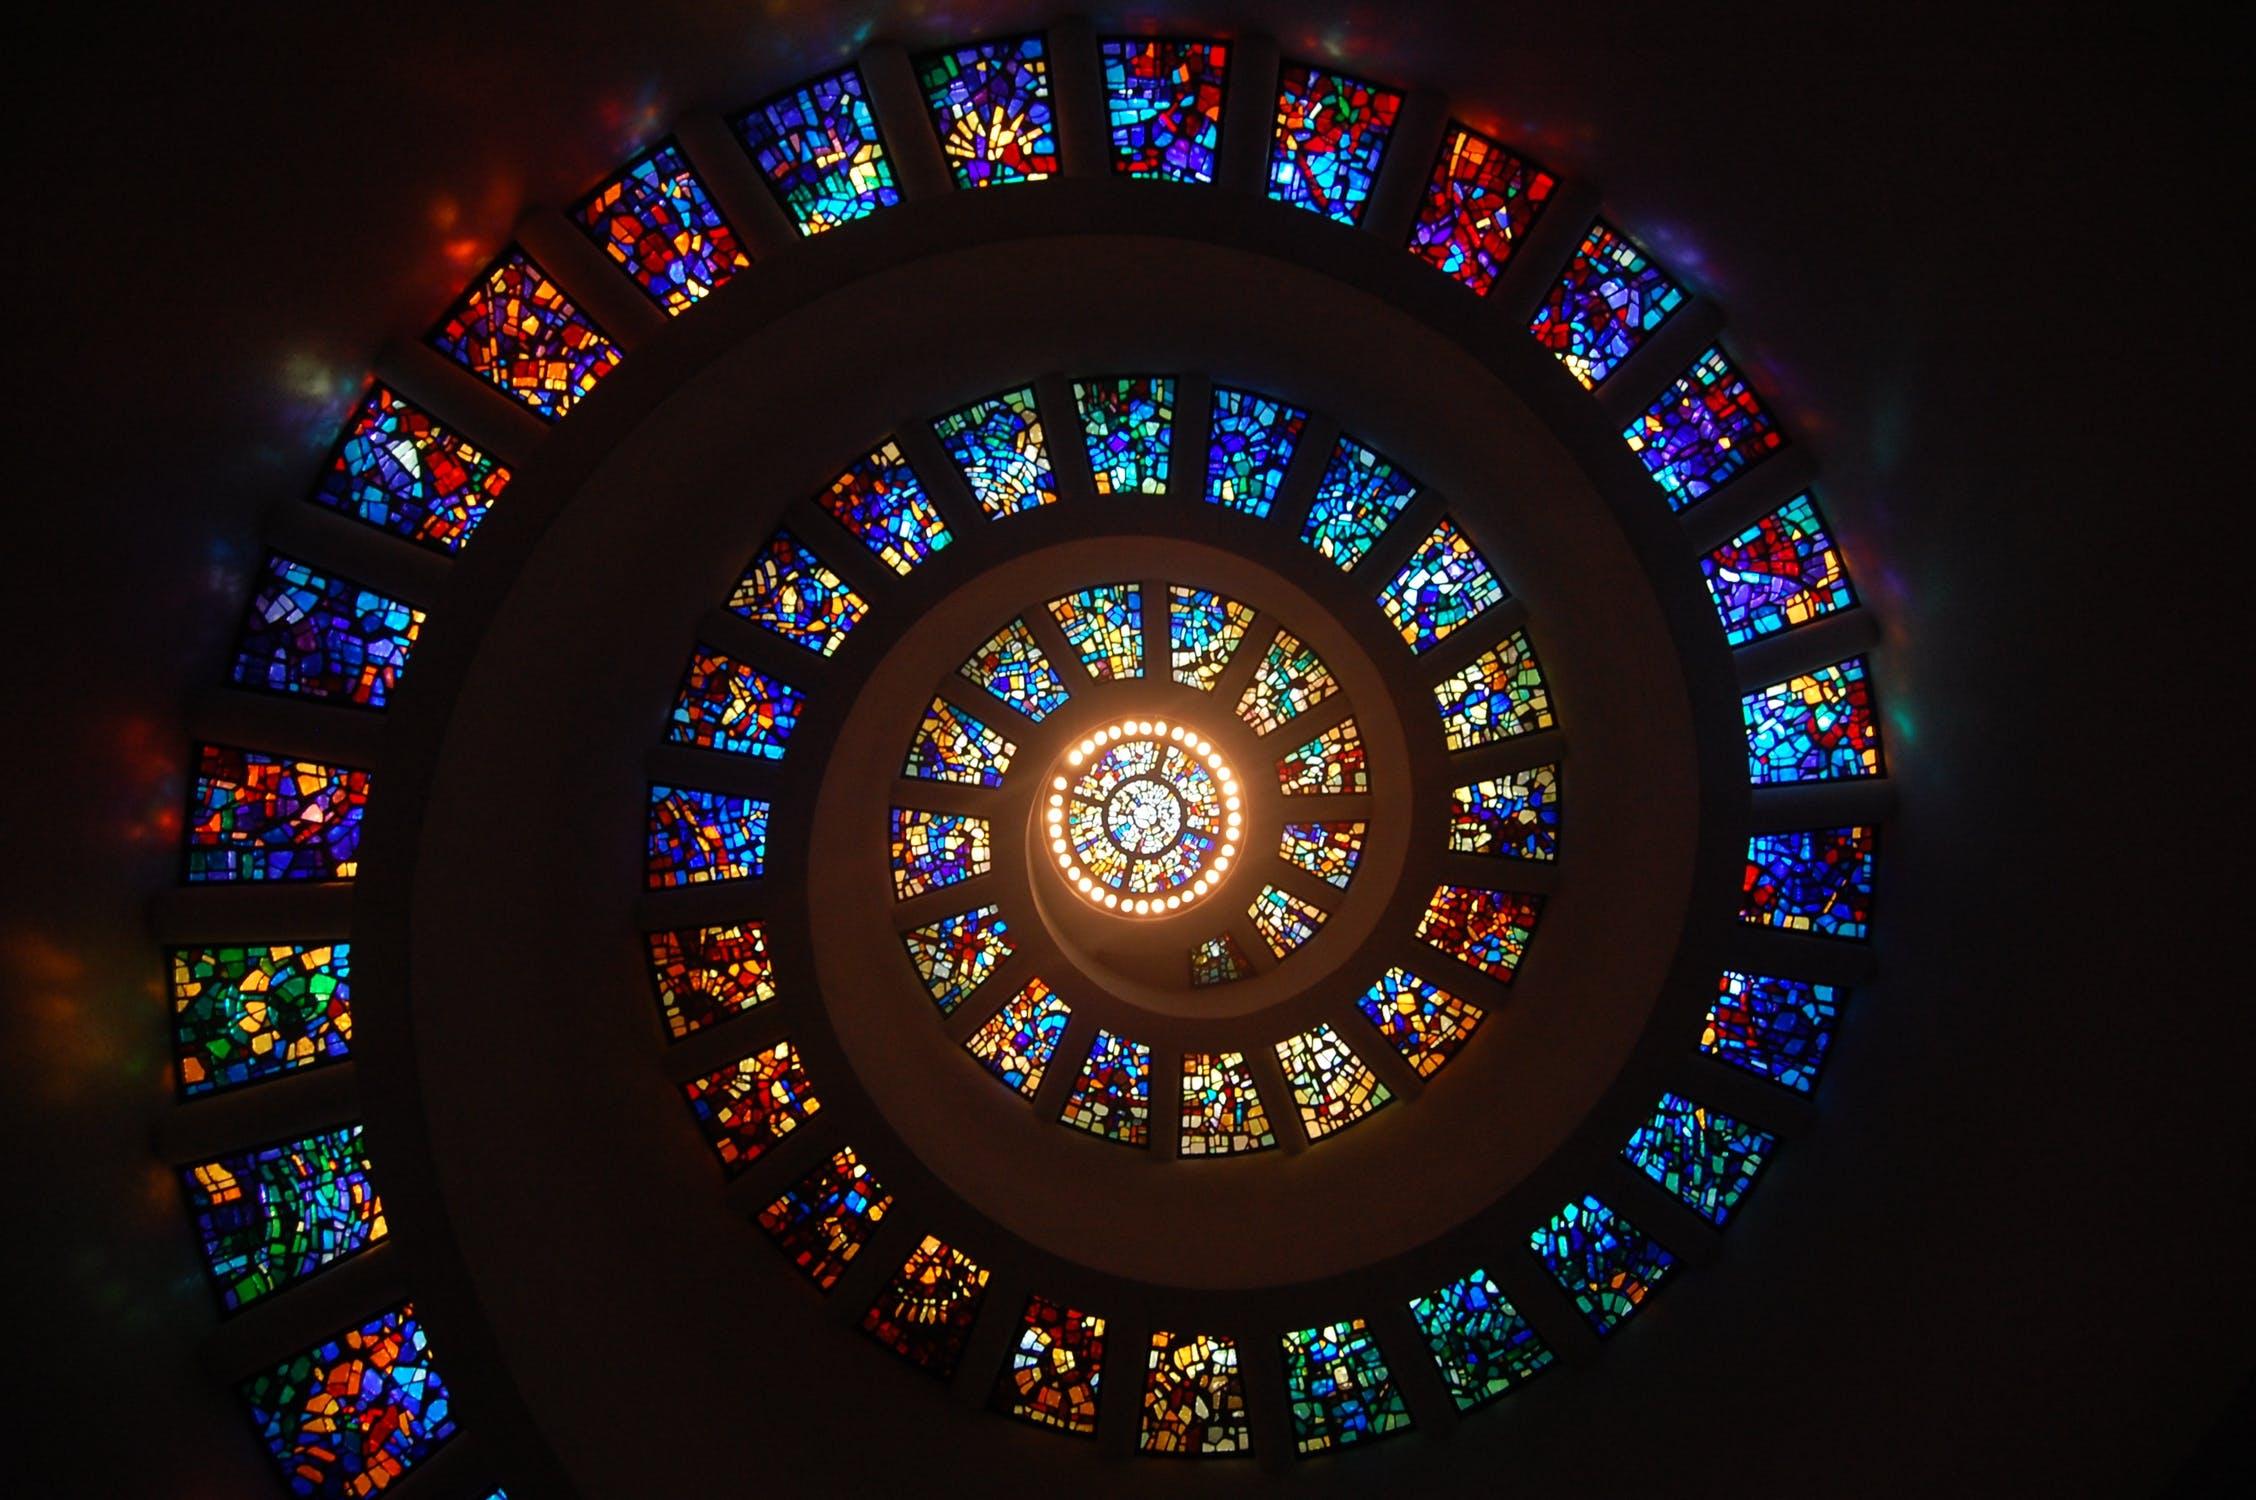 stained-glass-spiral-circle-pattern-161154.jpeg